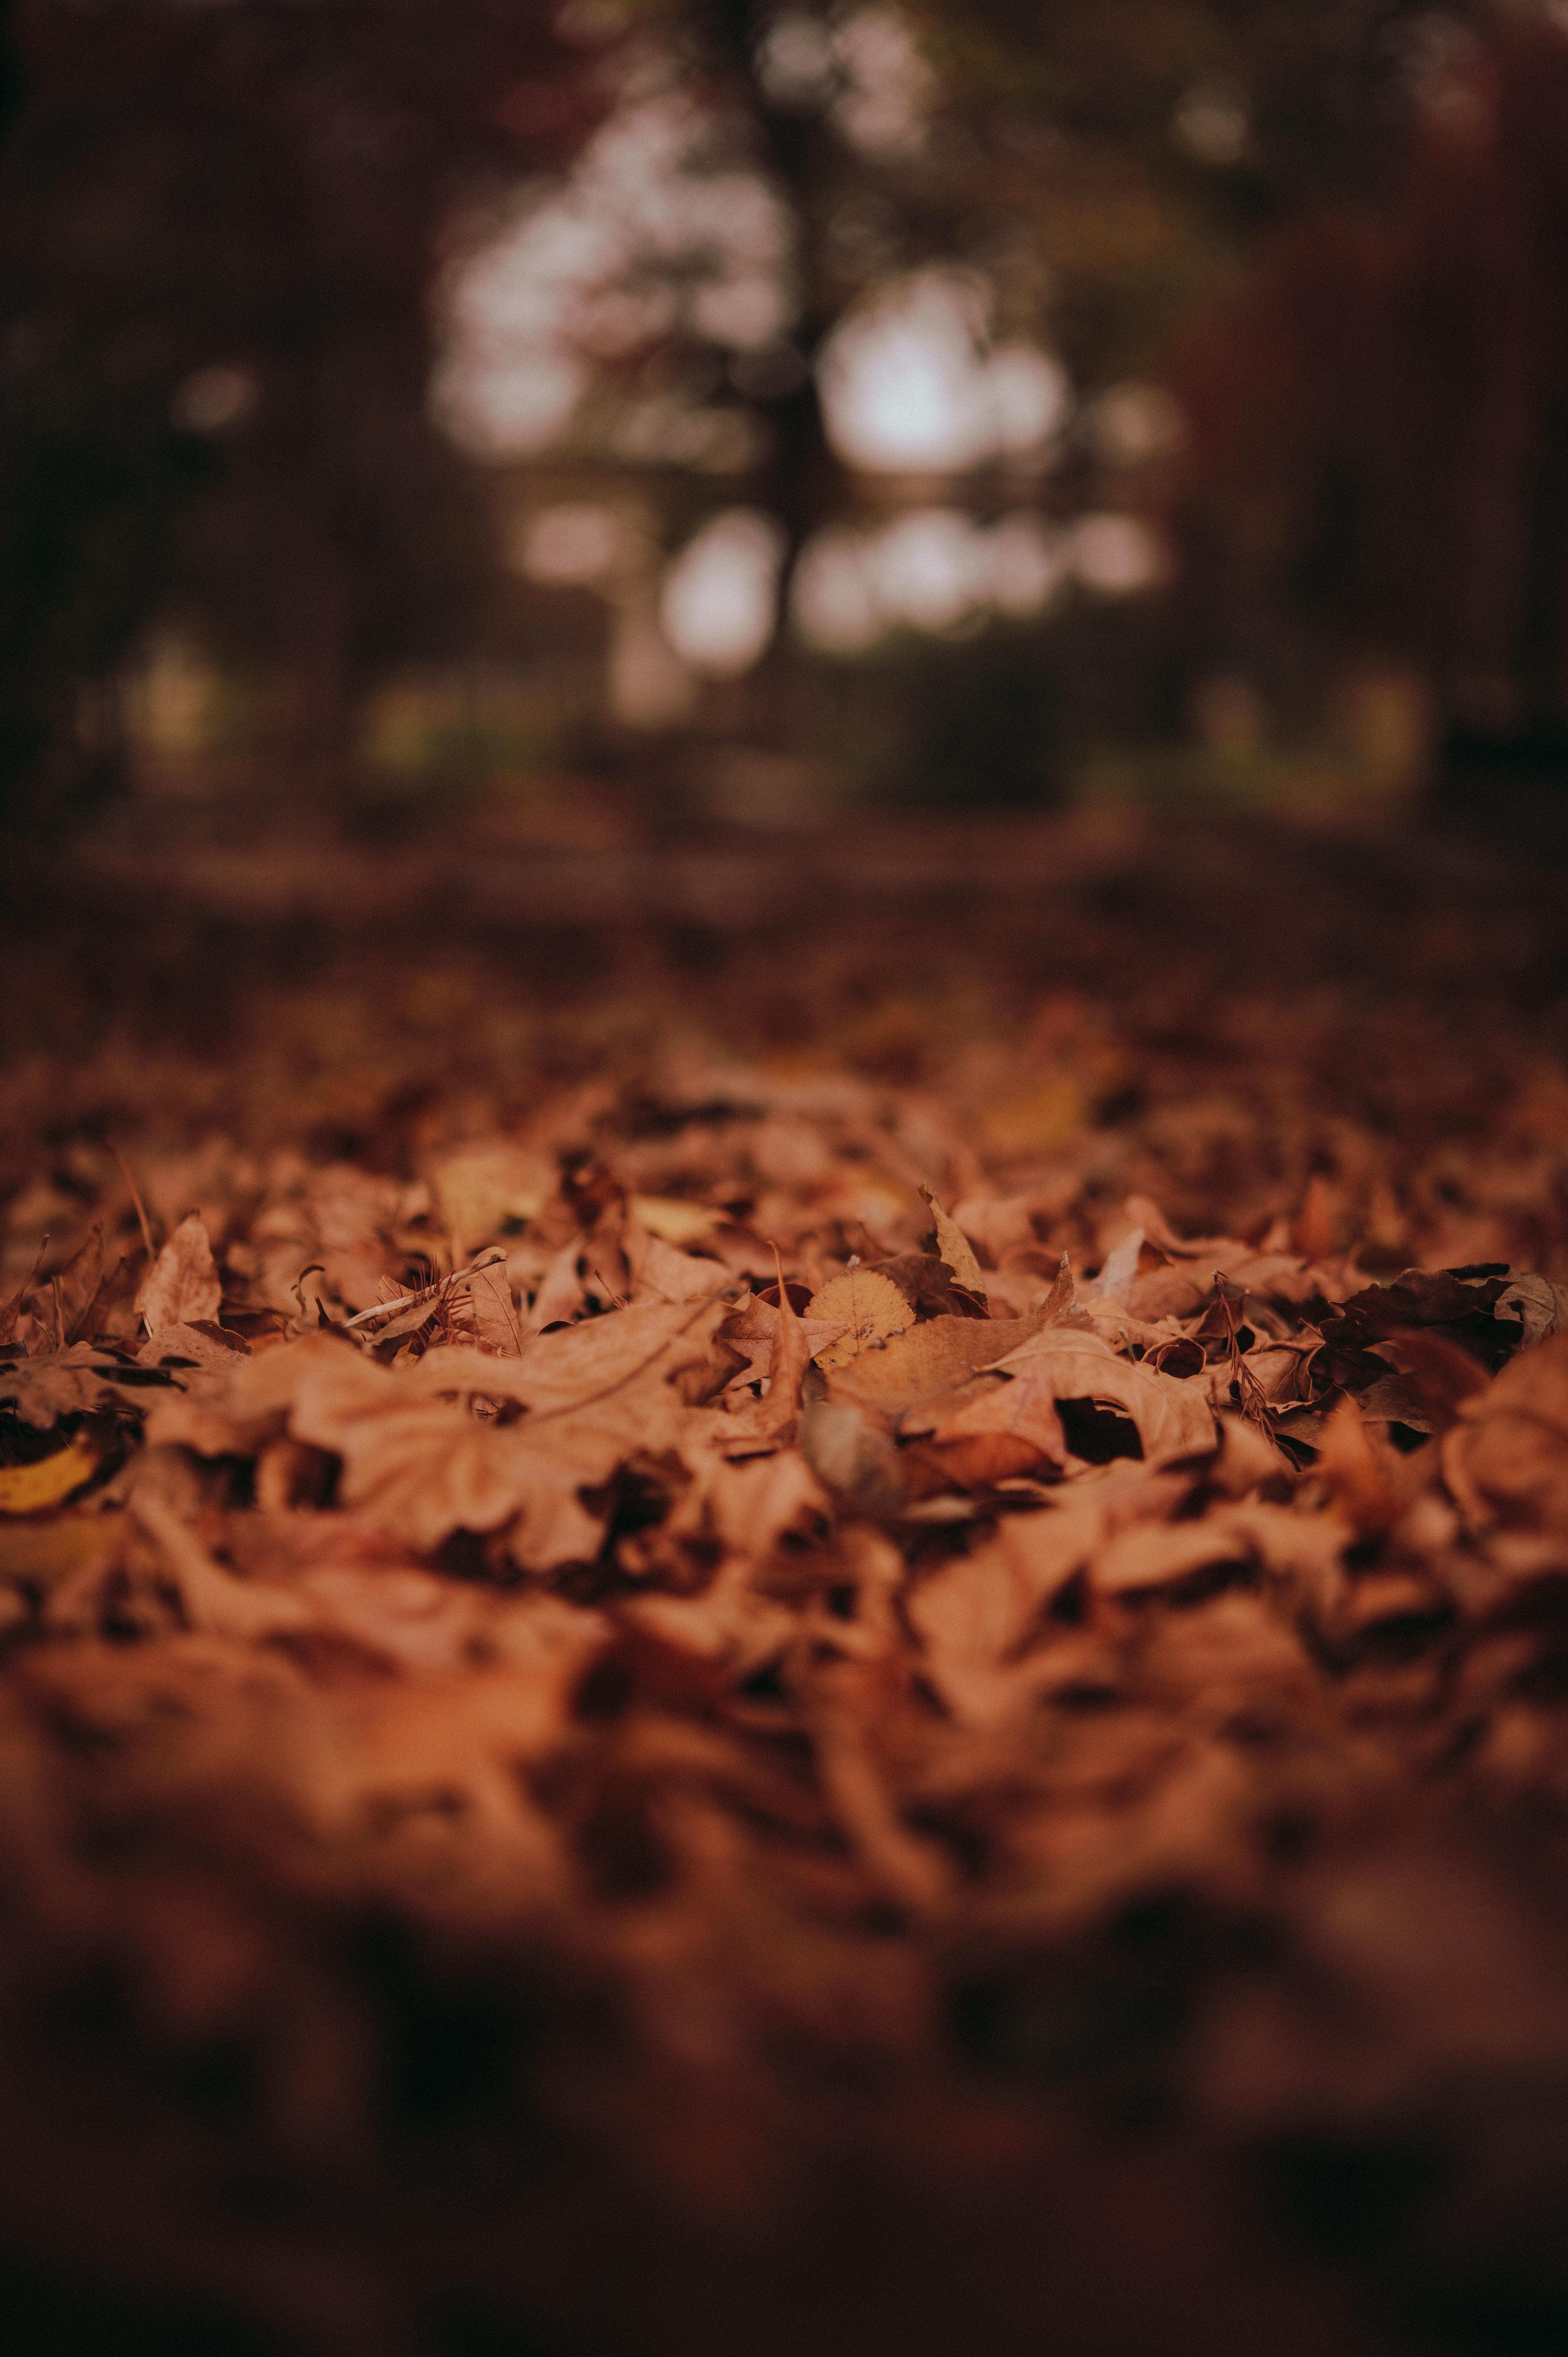 brown-dried-leaves-on-ground